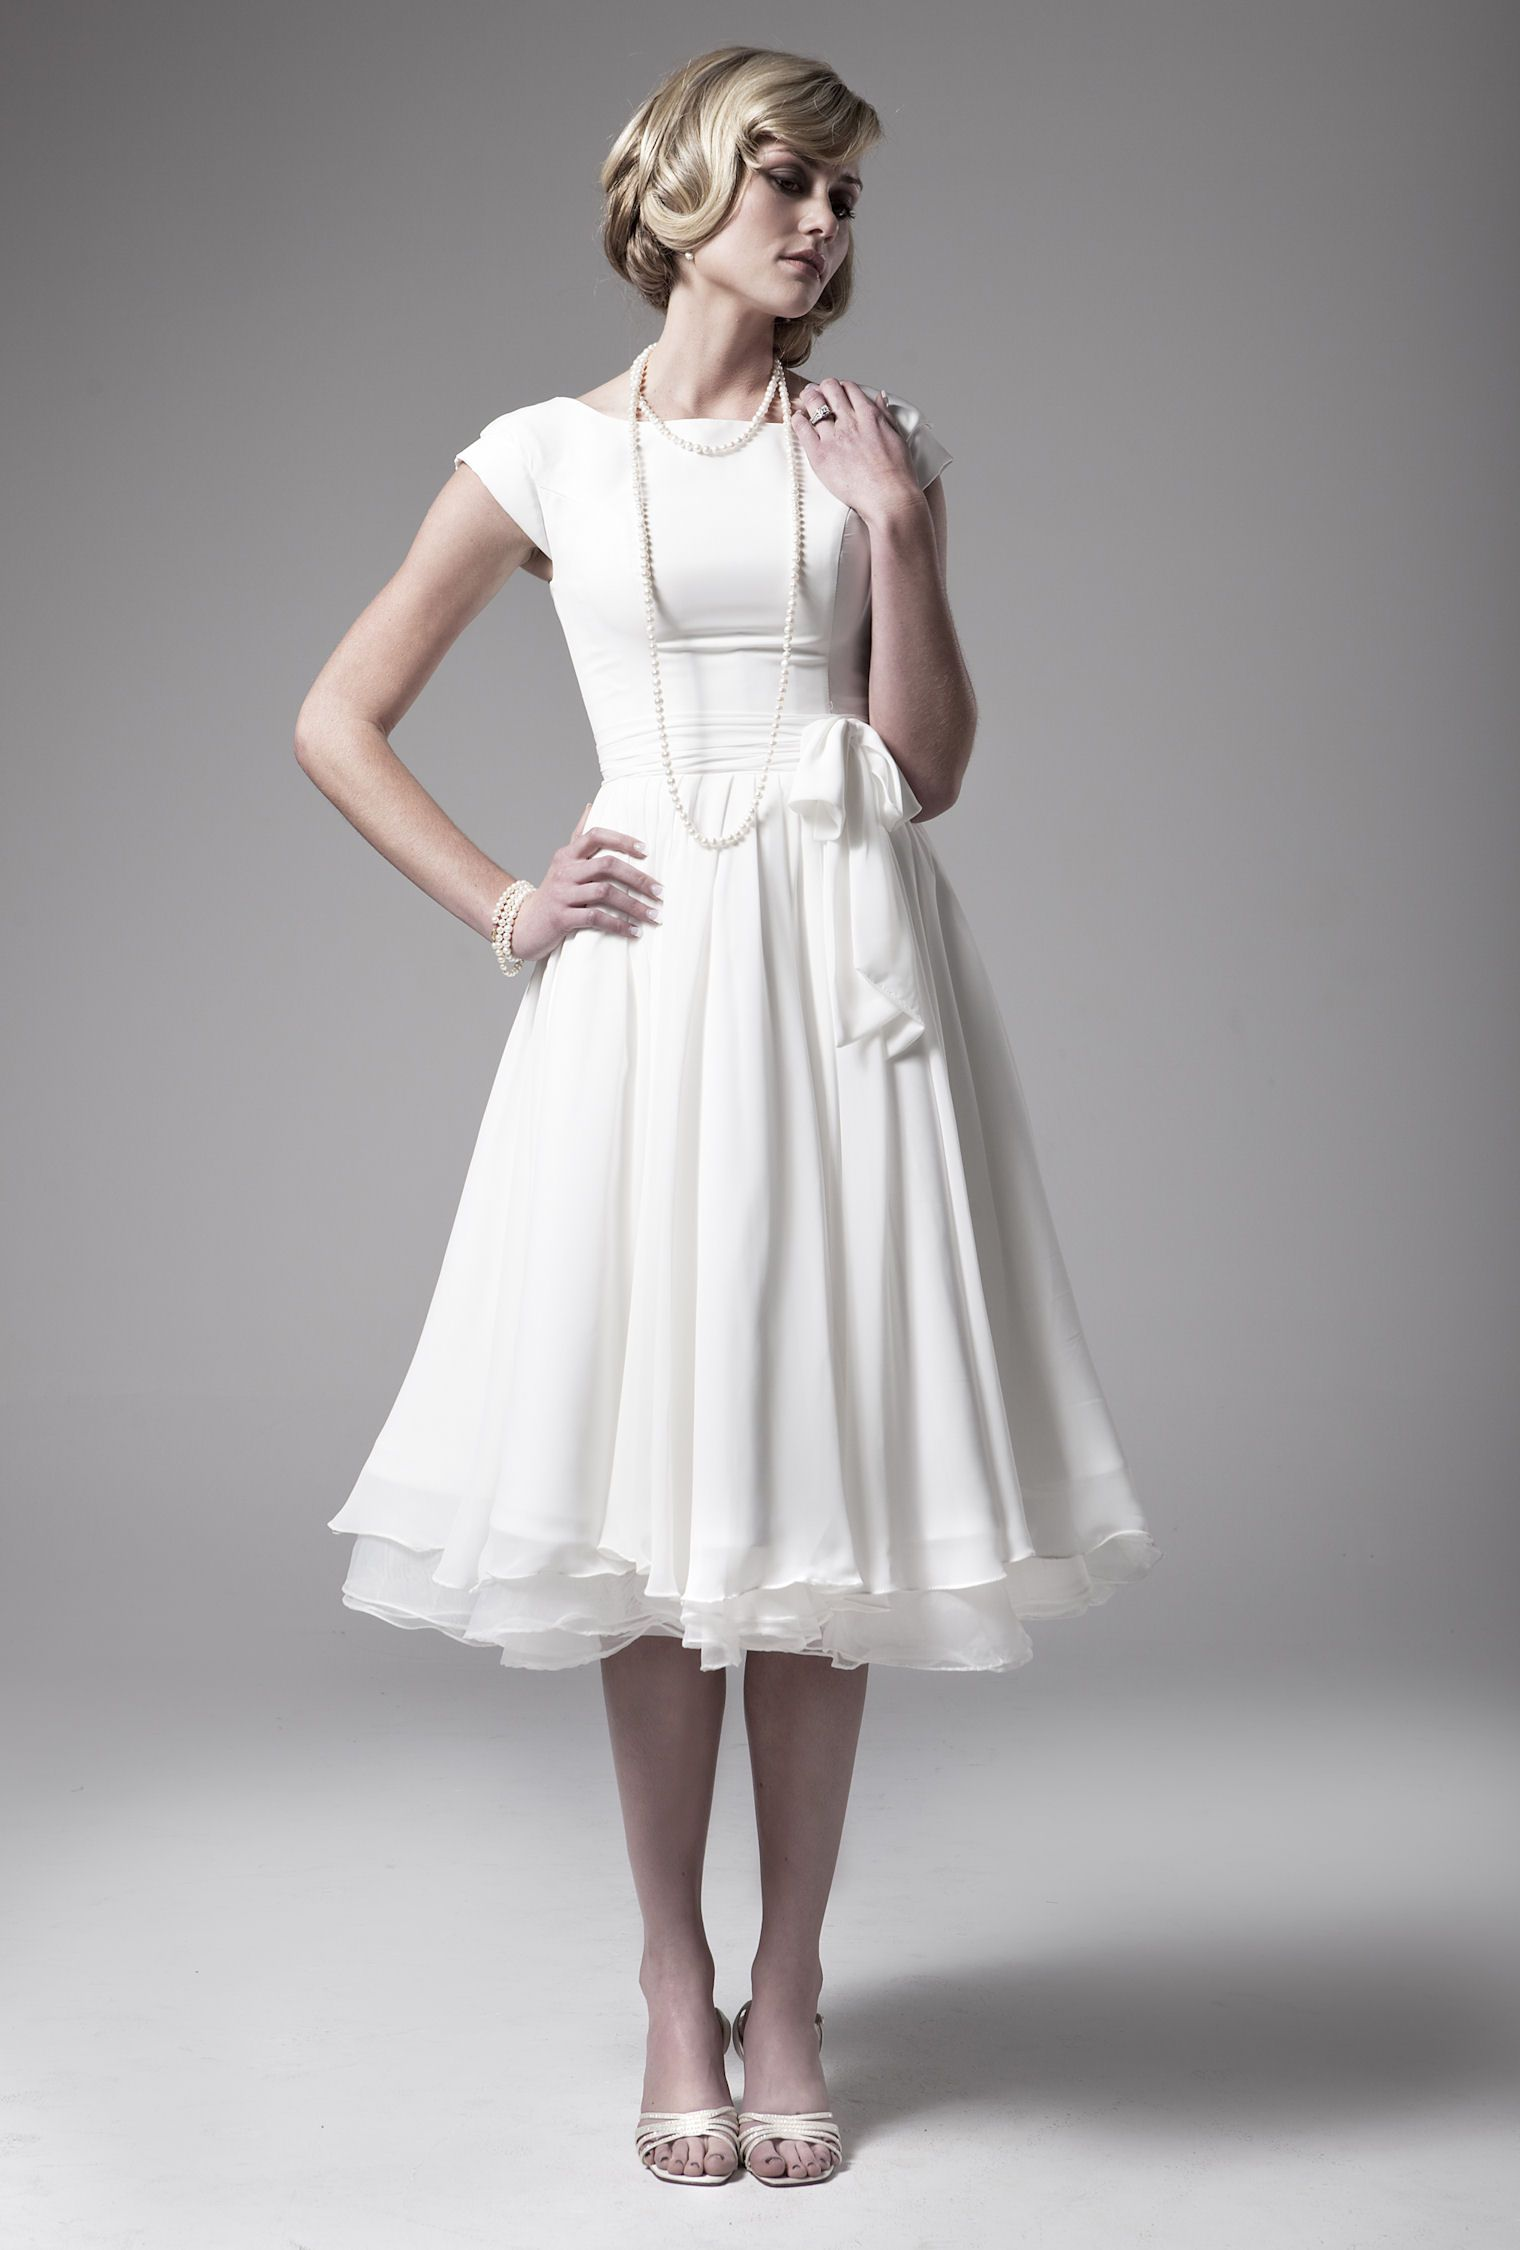 Rcpb9 Jpg 1520 2250 Tea Length Wedding Dress Casual Wedding Dress Short Wedding Dress [ 2250 x 1520 Pixel ]